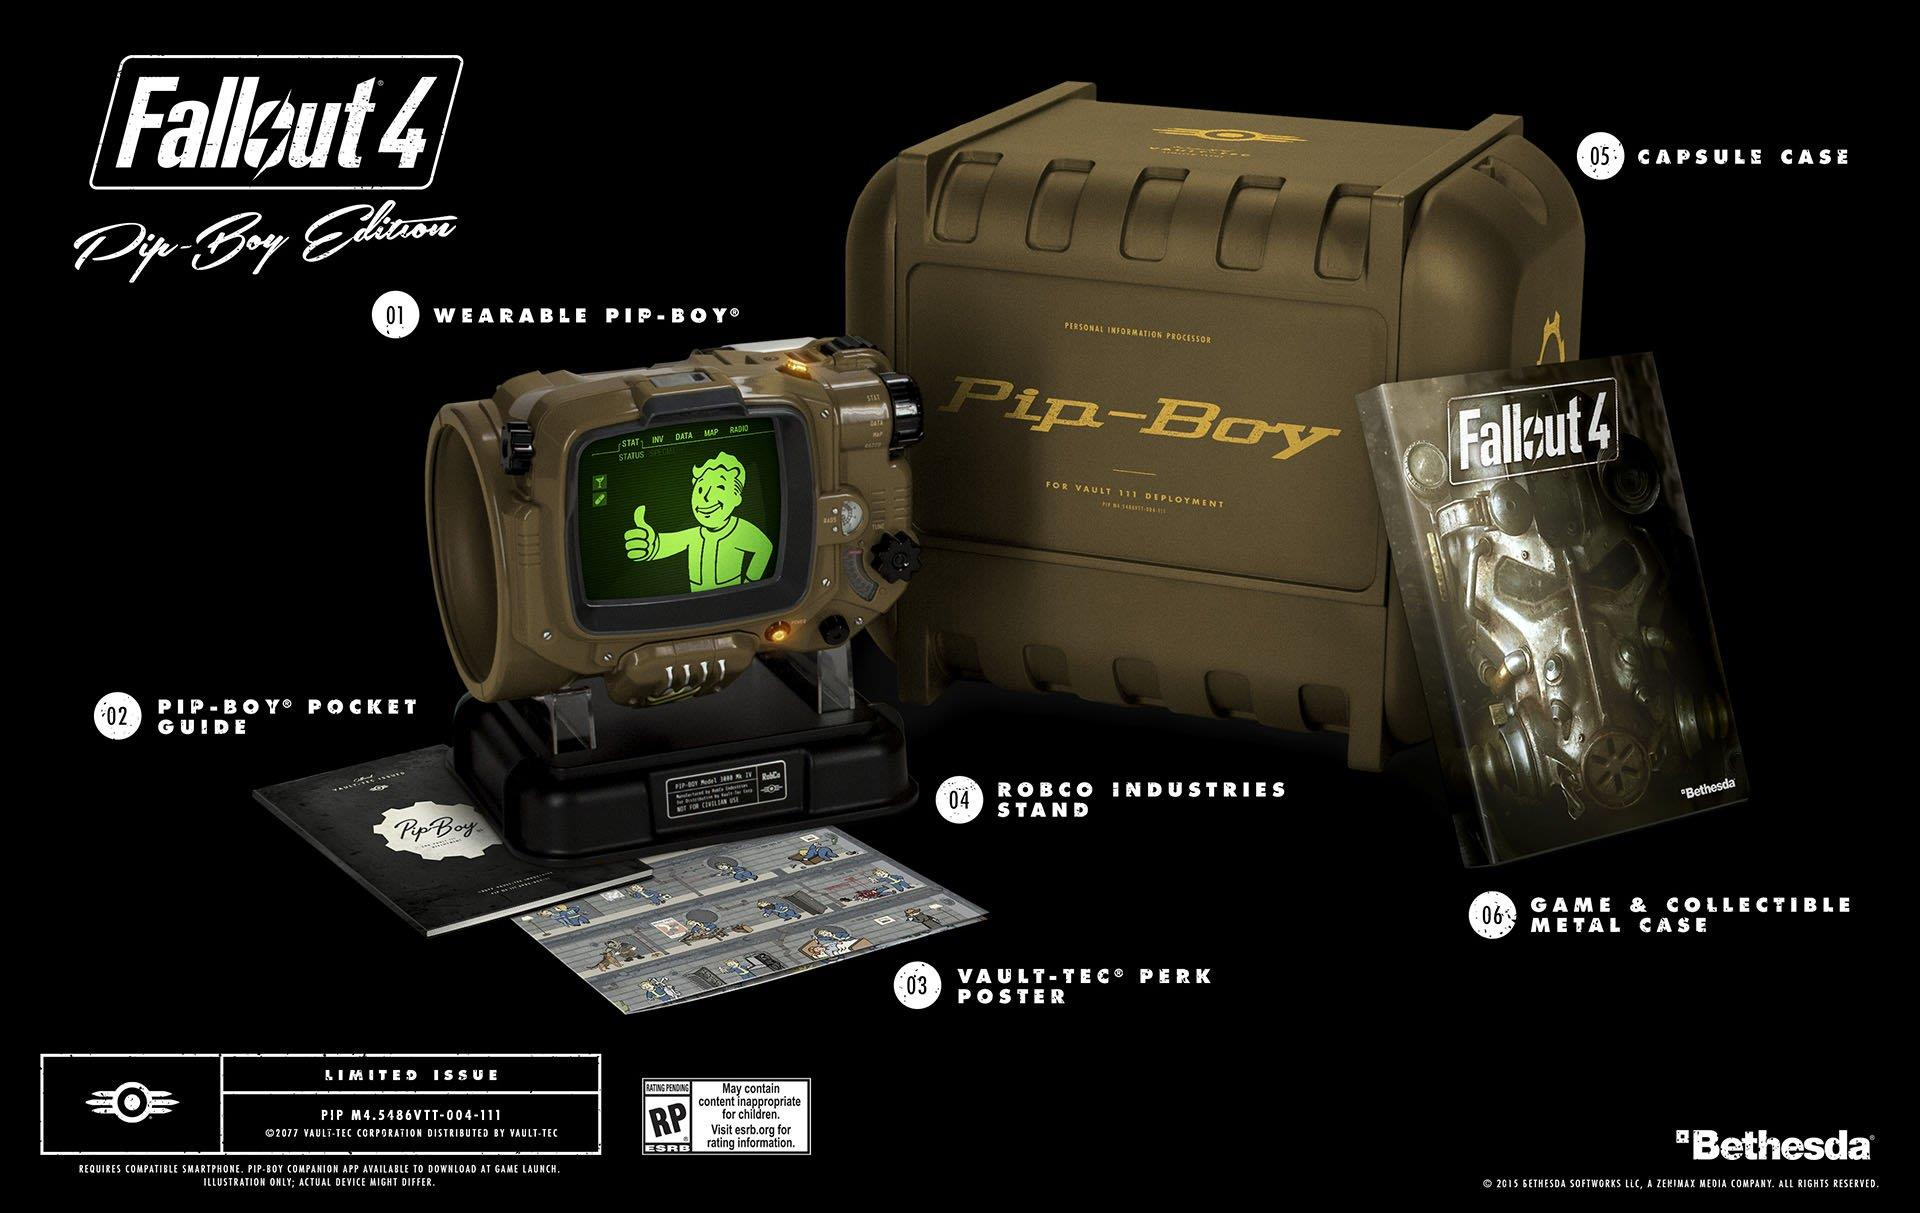 LaPip-Boy Edition di Fallout 4